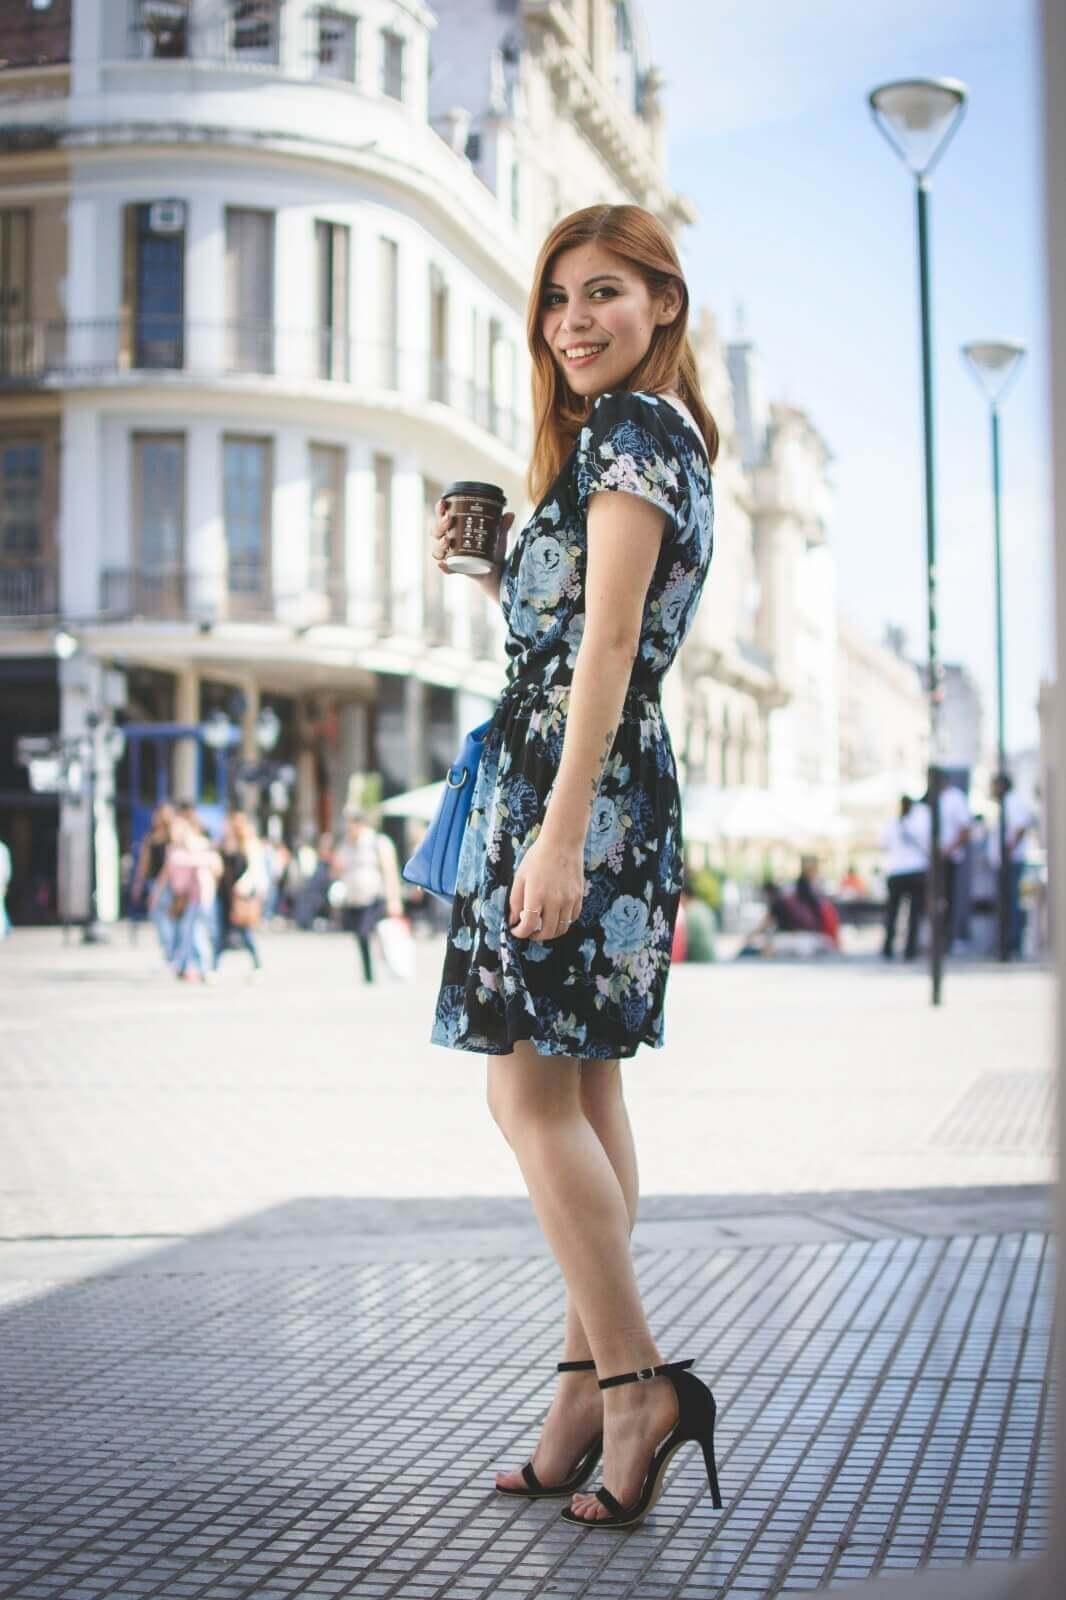 gamiss-black-strappy-sandals-blue-floral-dress-rosegal-cobalt-blue-tote-bag-deborah-ferrero-style-by-deb05